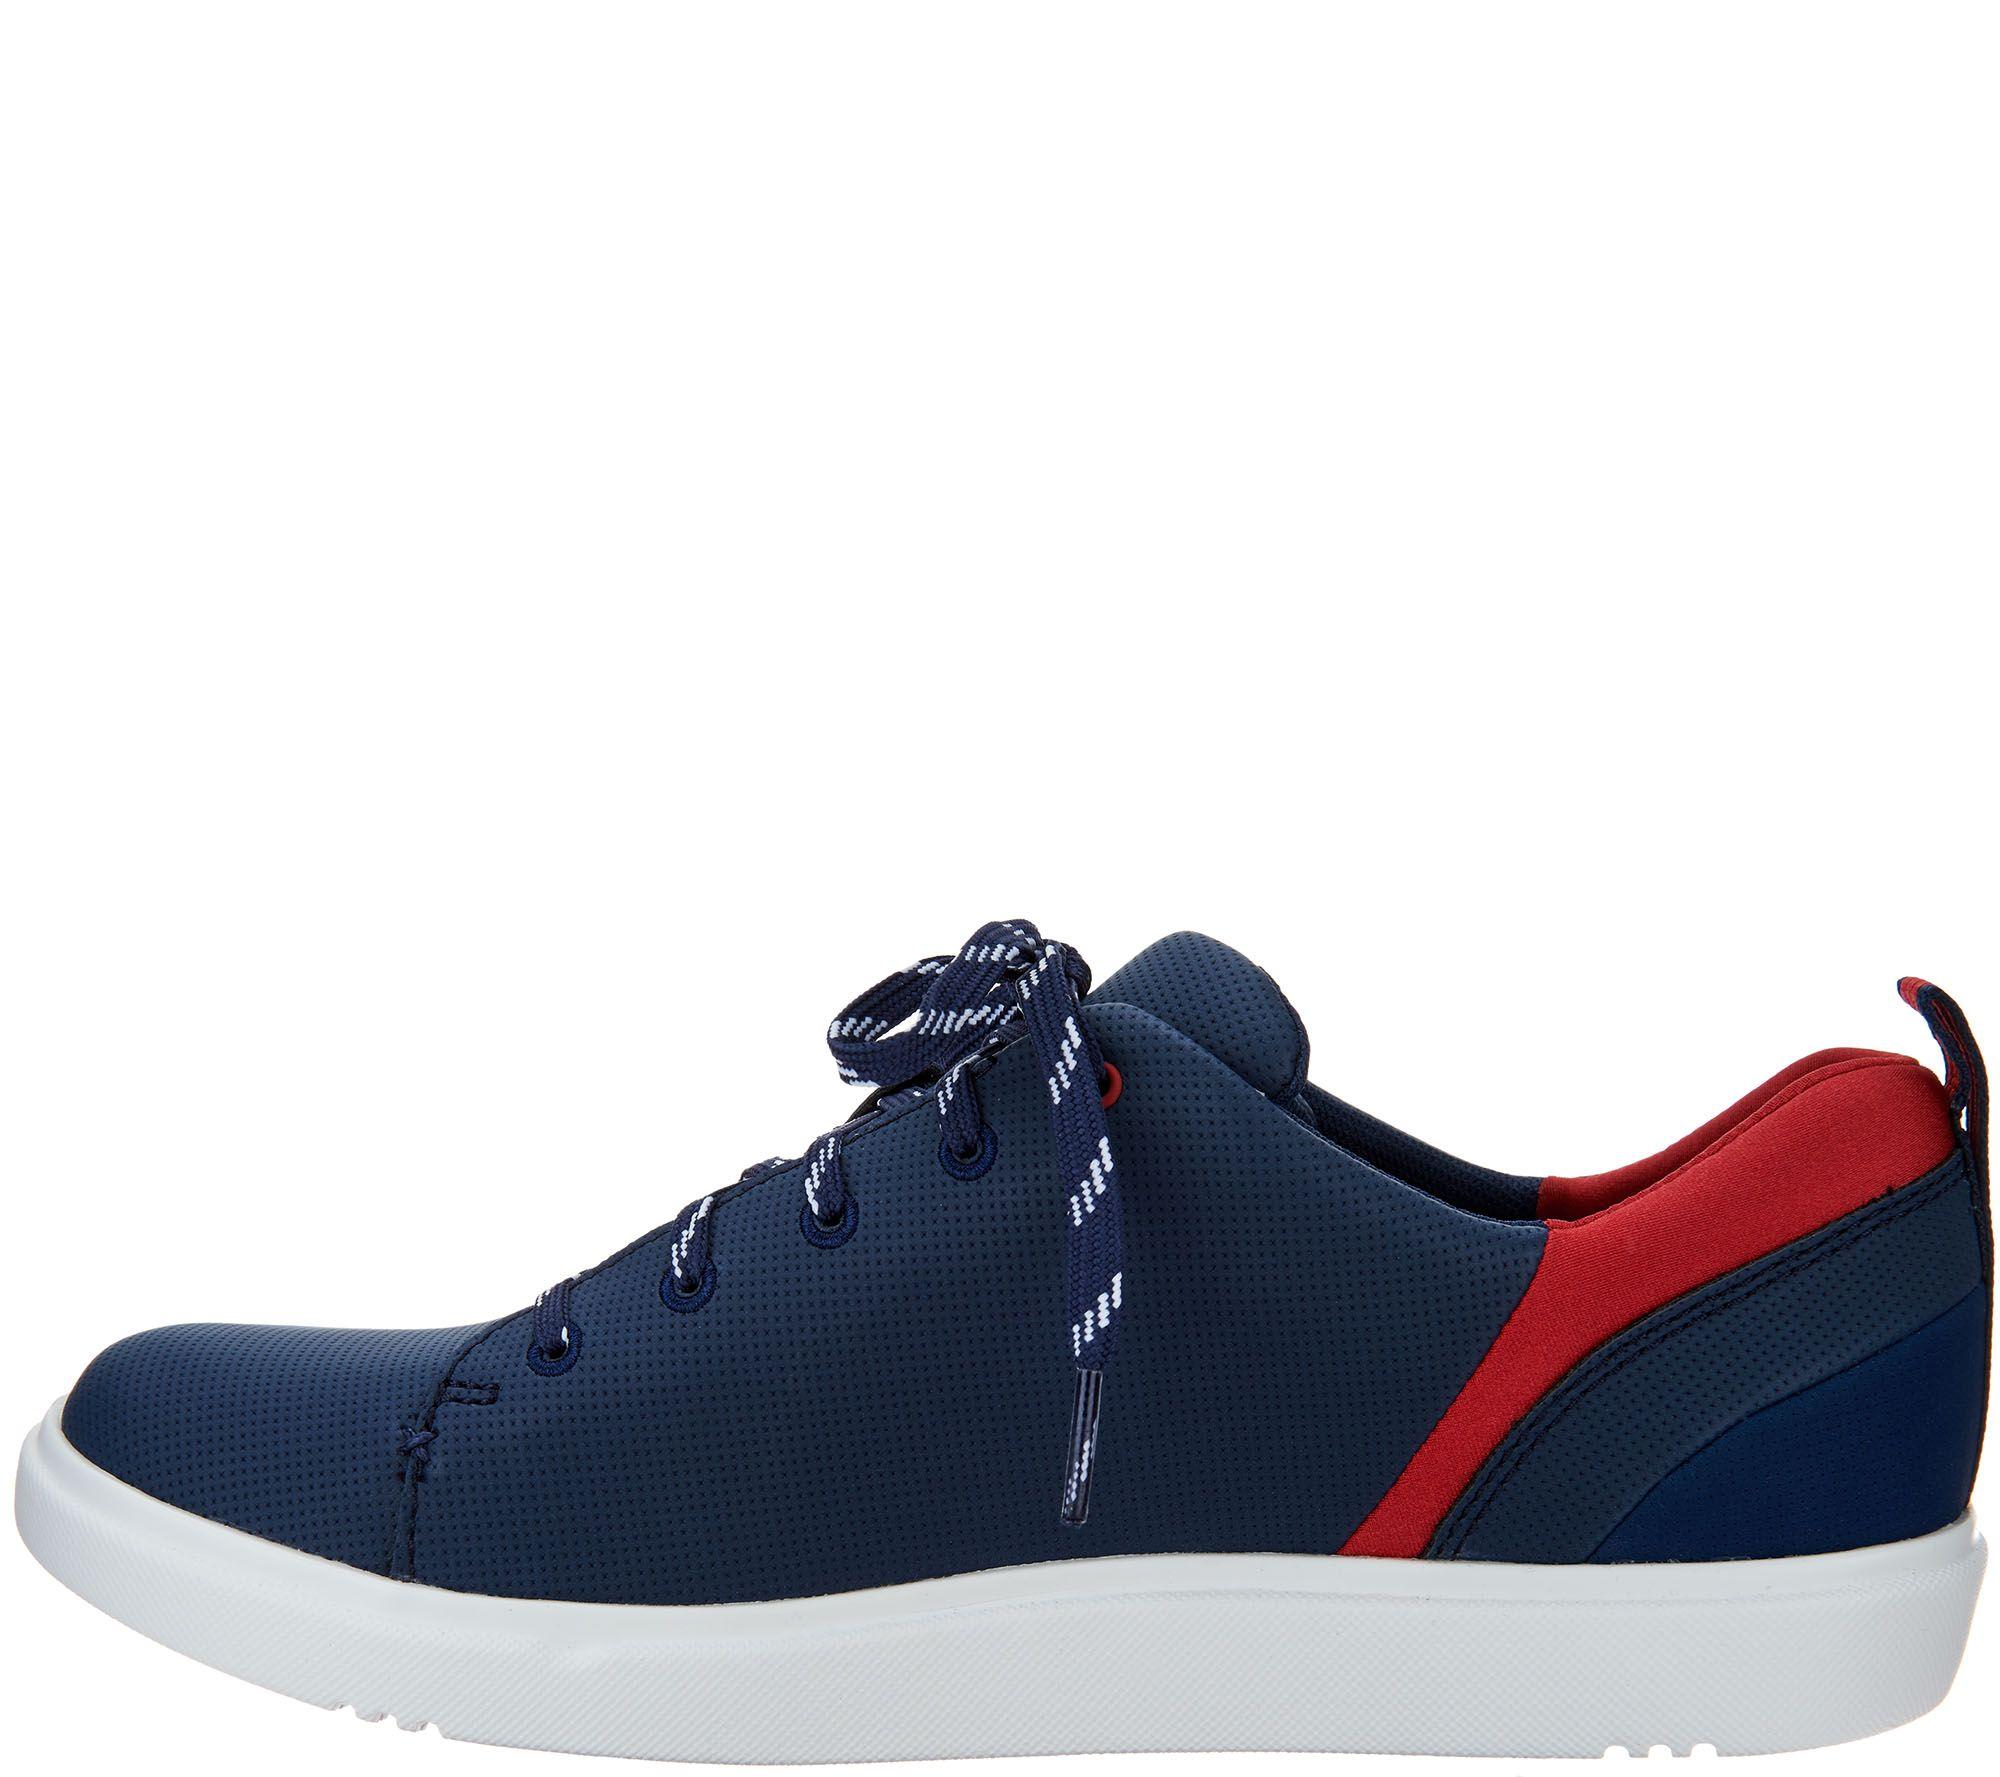 6f3d1c7faf4 CLOUDSTEPPERS by Clarks Lace Up Sport Shoes - Step Verve Lo - Page 1 —  QVC.com